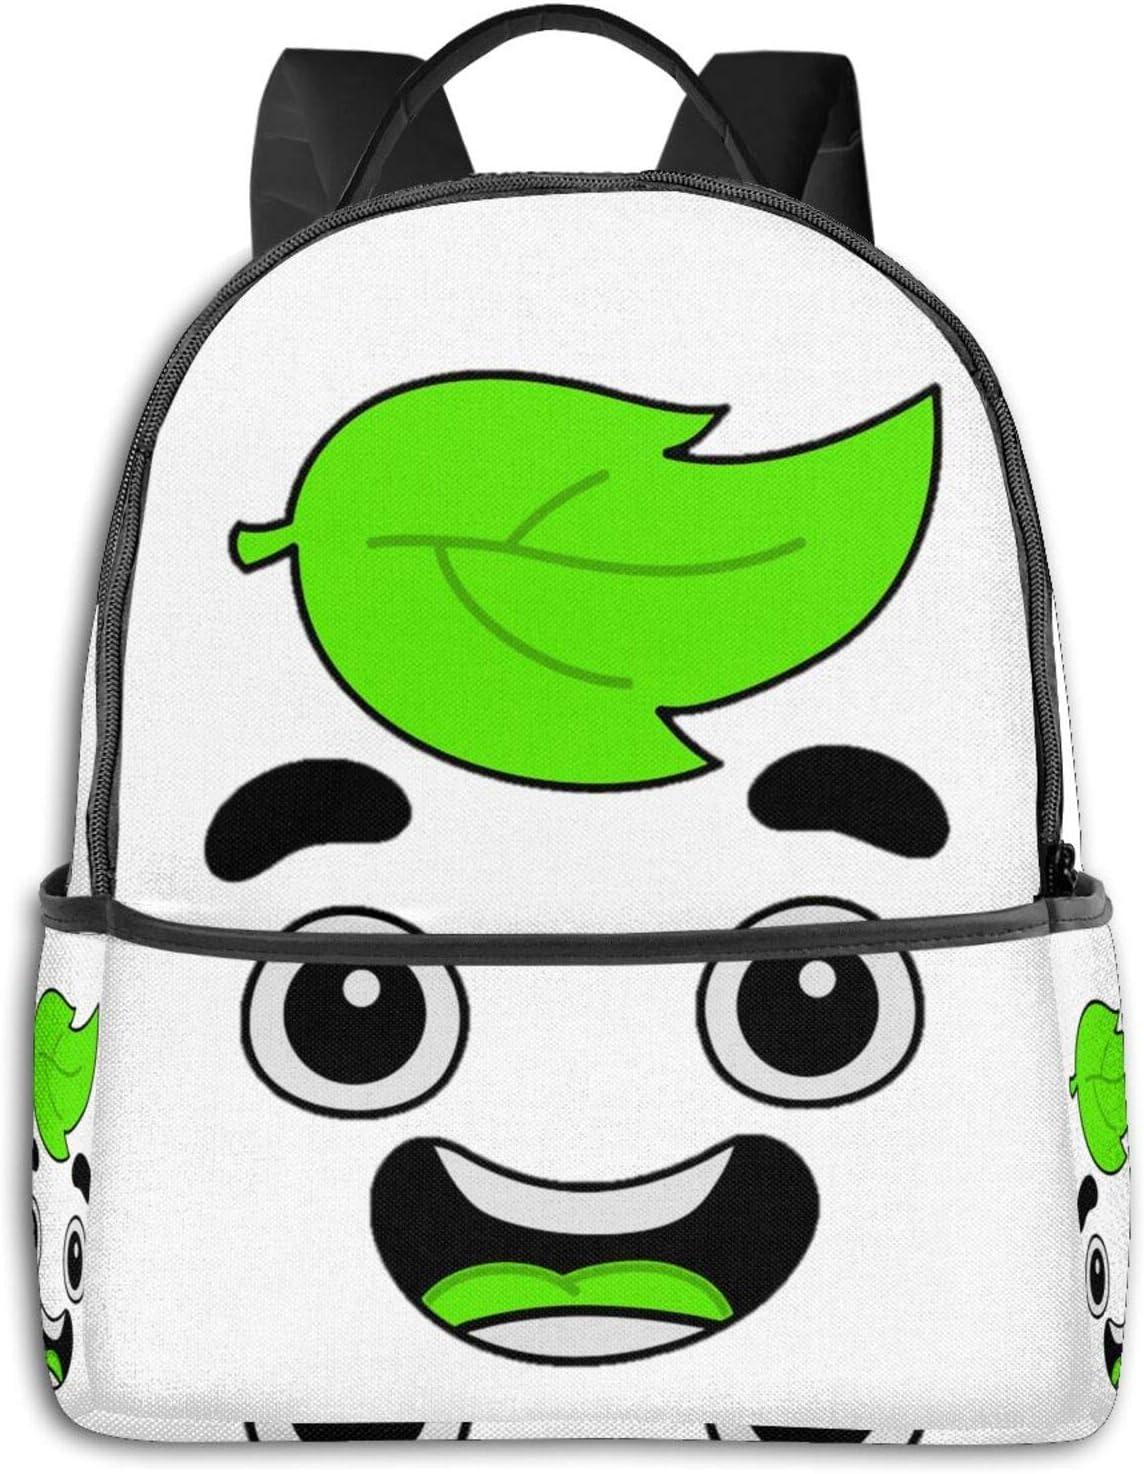 Guava 価格交渉OK送料無料 Juice Pullover Hoodie Student Cycling Le Bag School 直営ストア